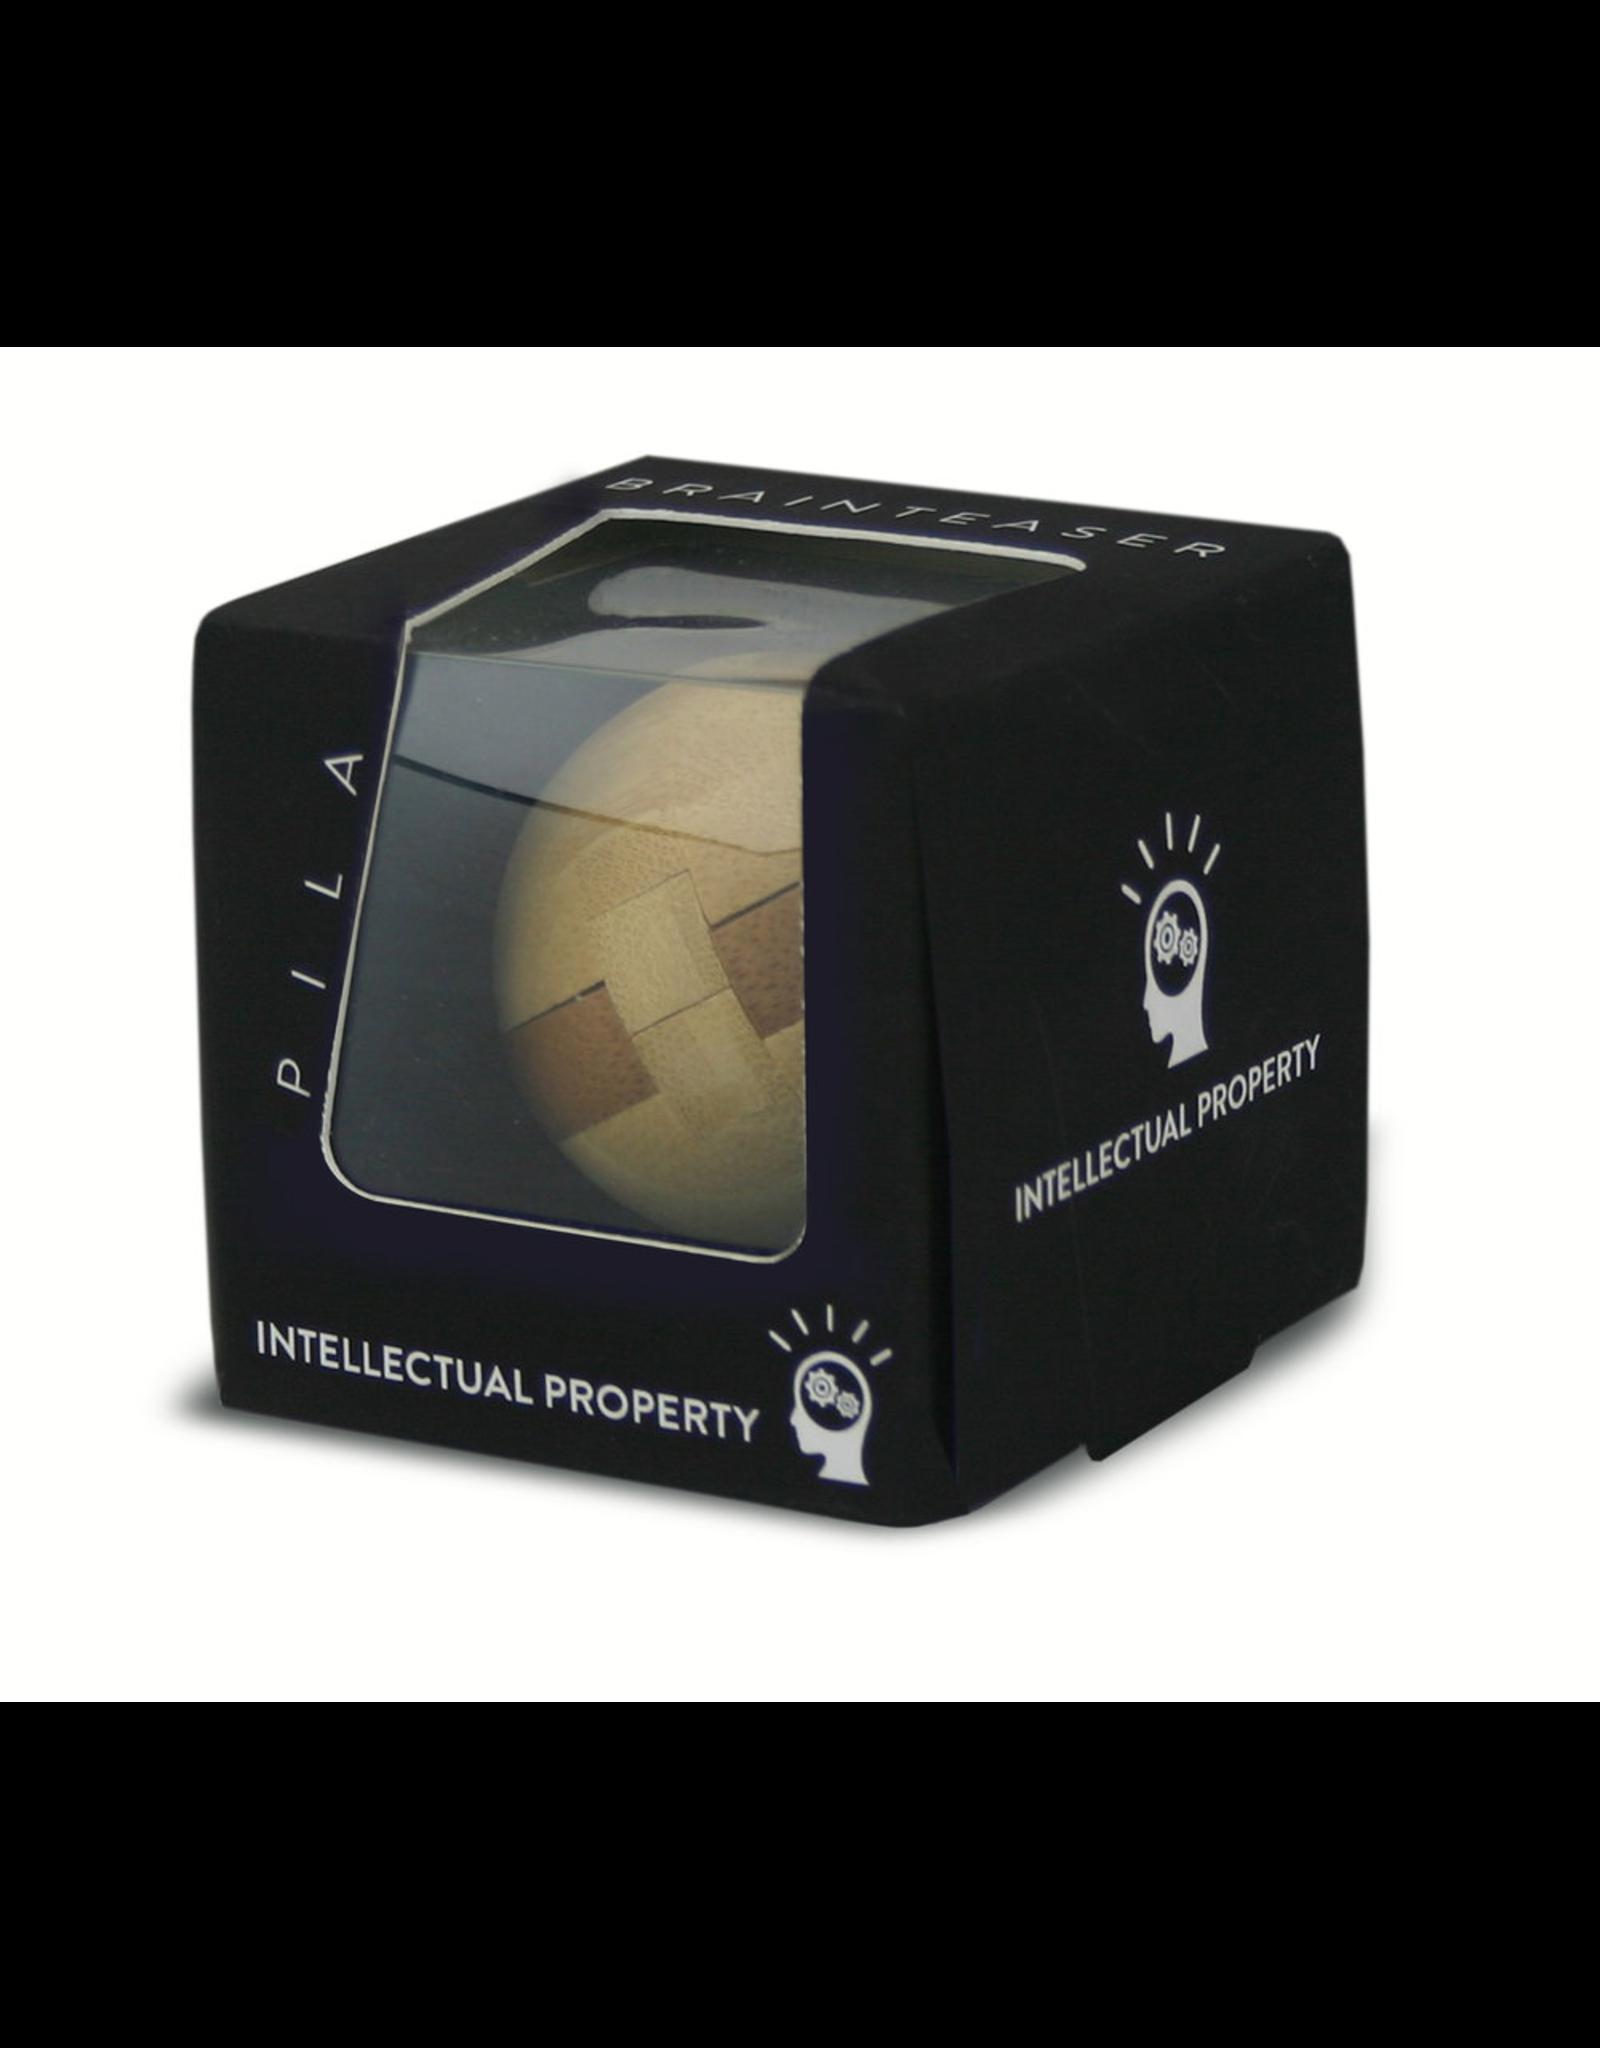 Project Genius Intellectual Property Puzzle: Pila